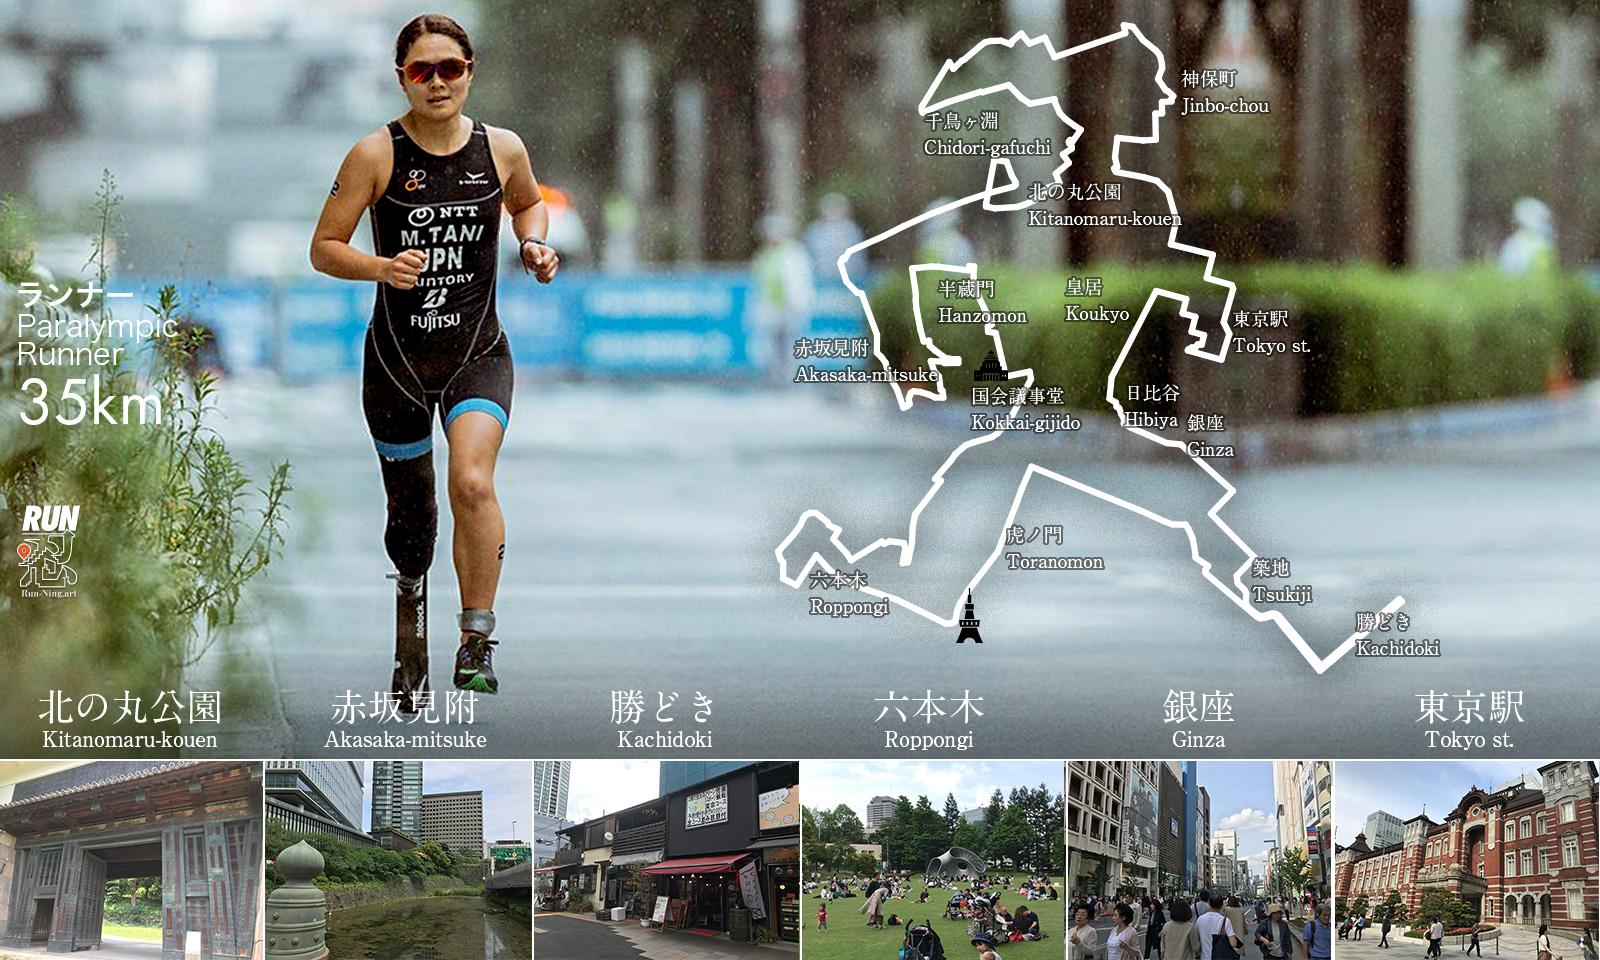 GPSアート:パラリンピックランナー